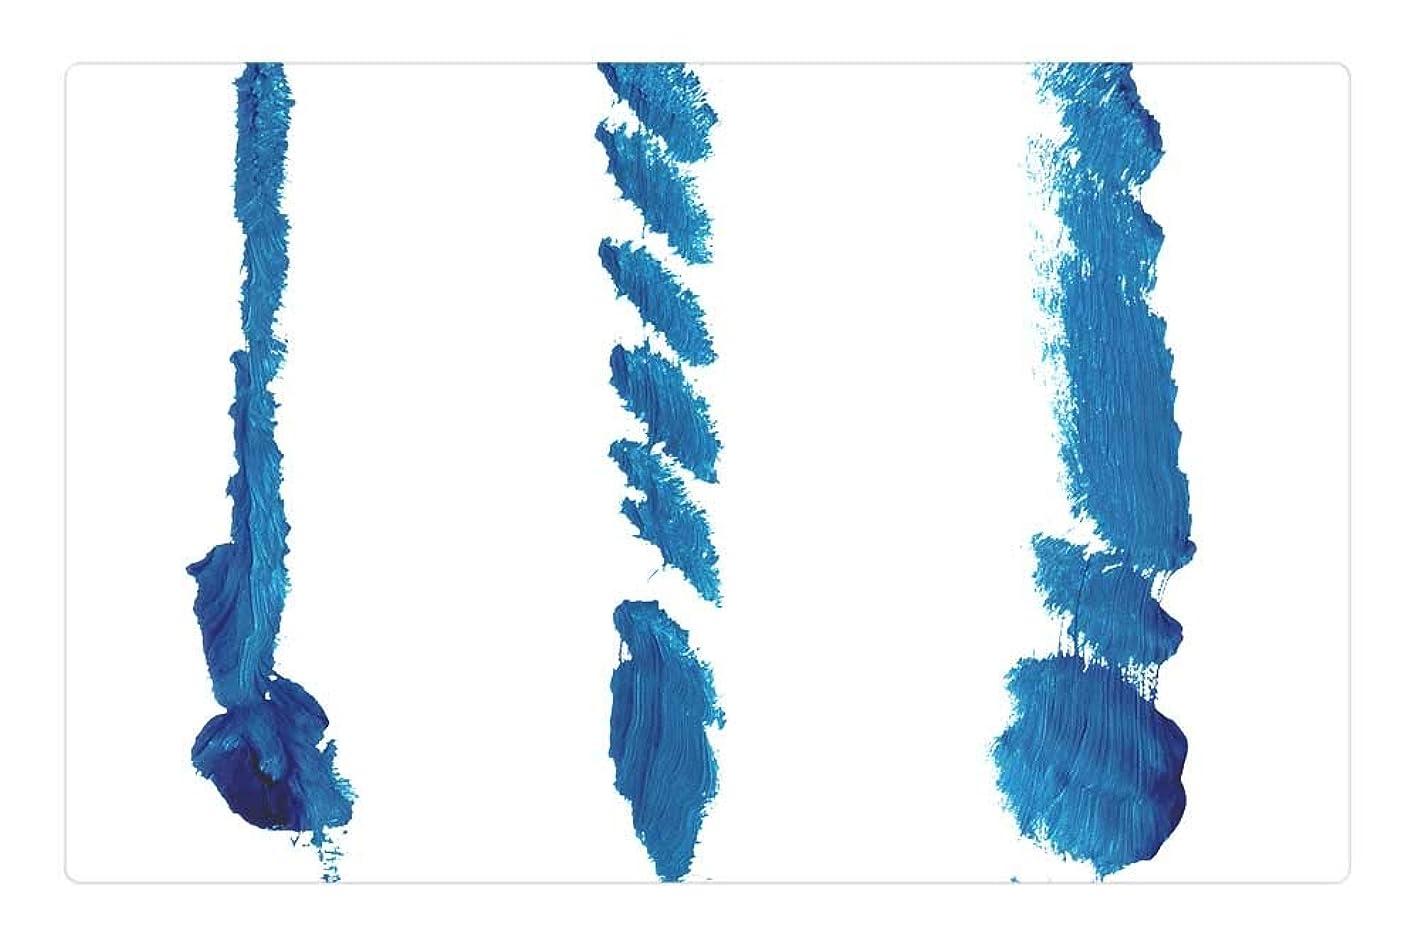 Tree26 Indoor Floor Rug/Mat (23.6 x 15.7 Inch) - Brush Paint Art Paint Brush Paintbrush Artist 1